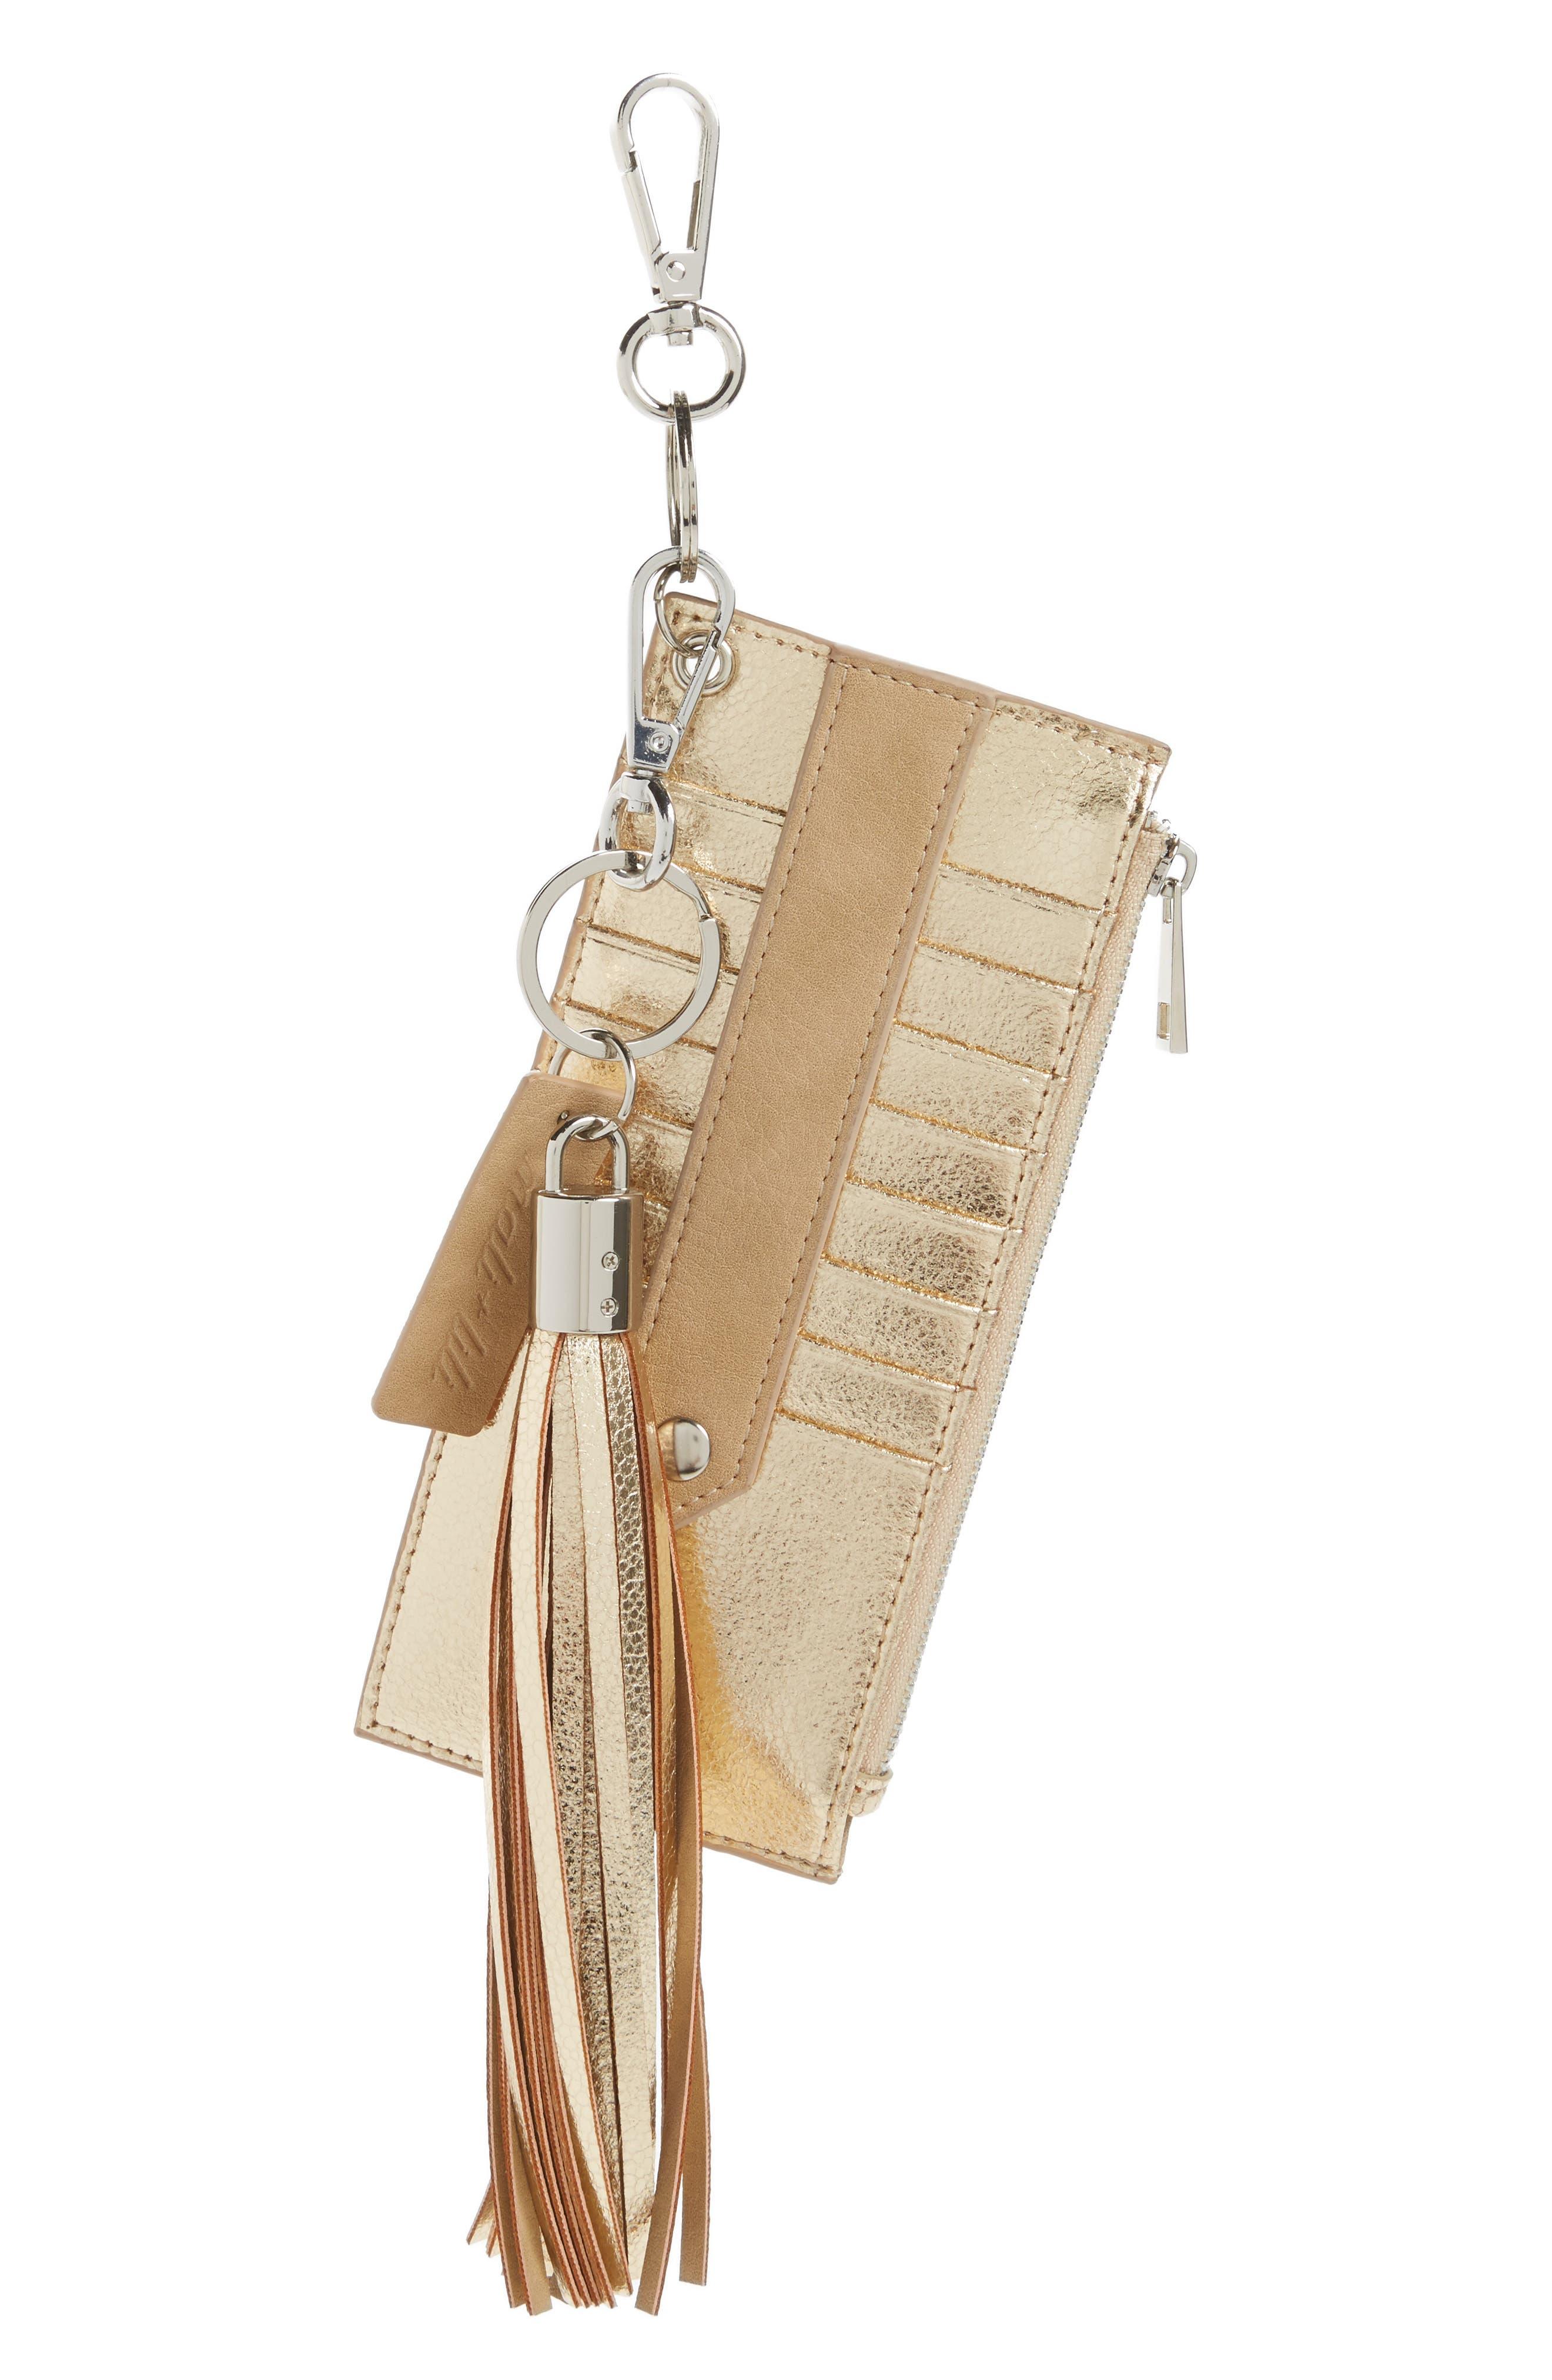 Mali + Lili Sydney Vegan Leather Card Case with Tassel Charm,                             Main thumbnail 2, color,